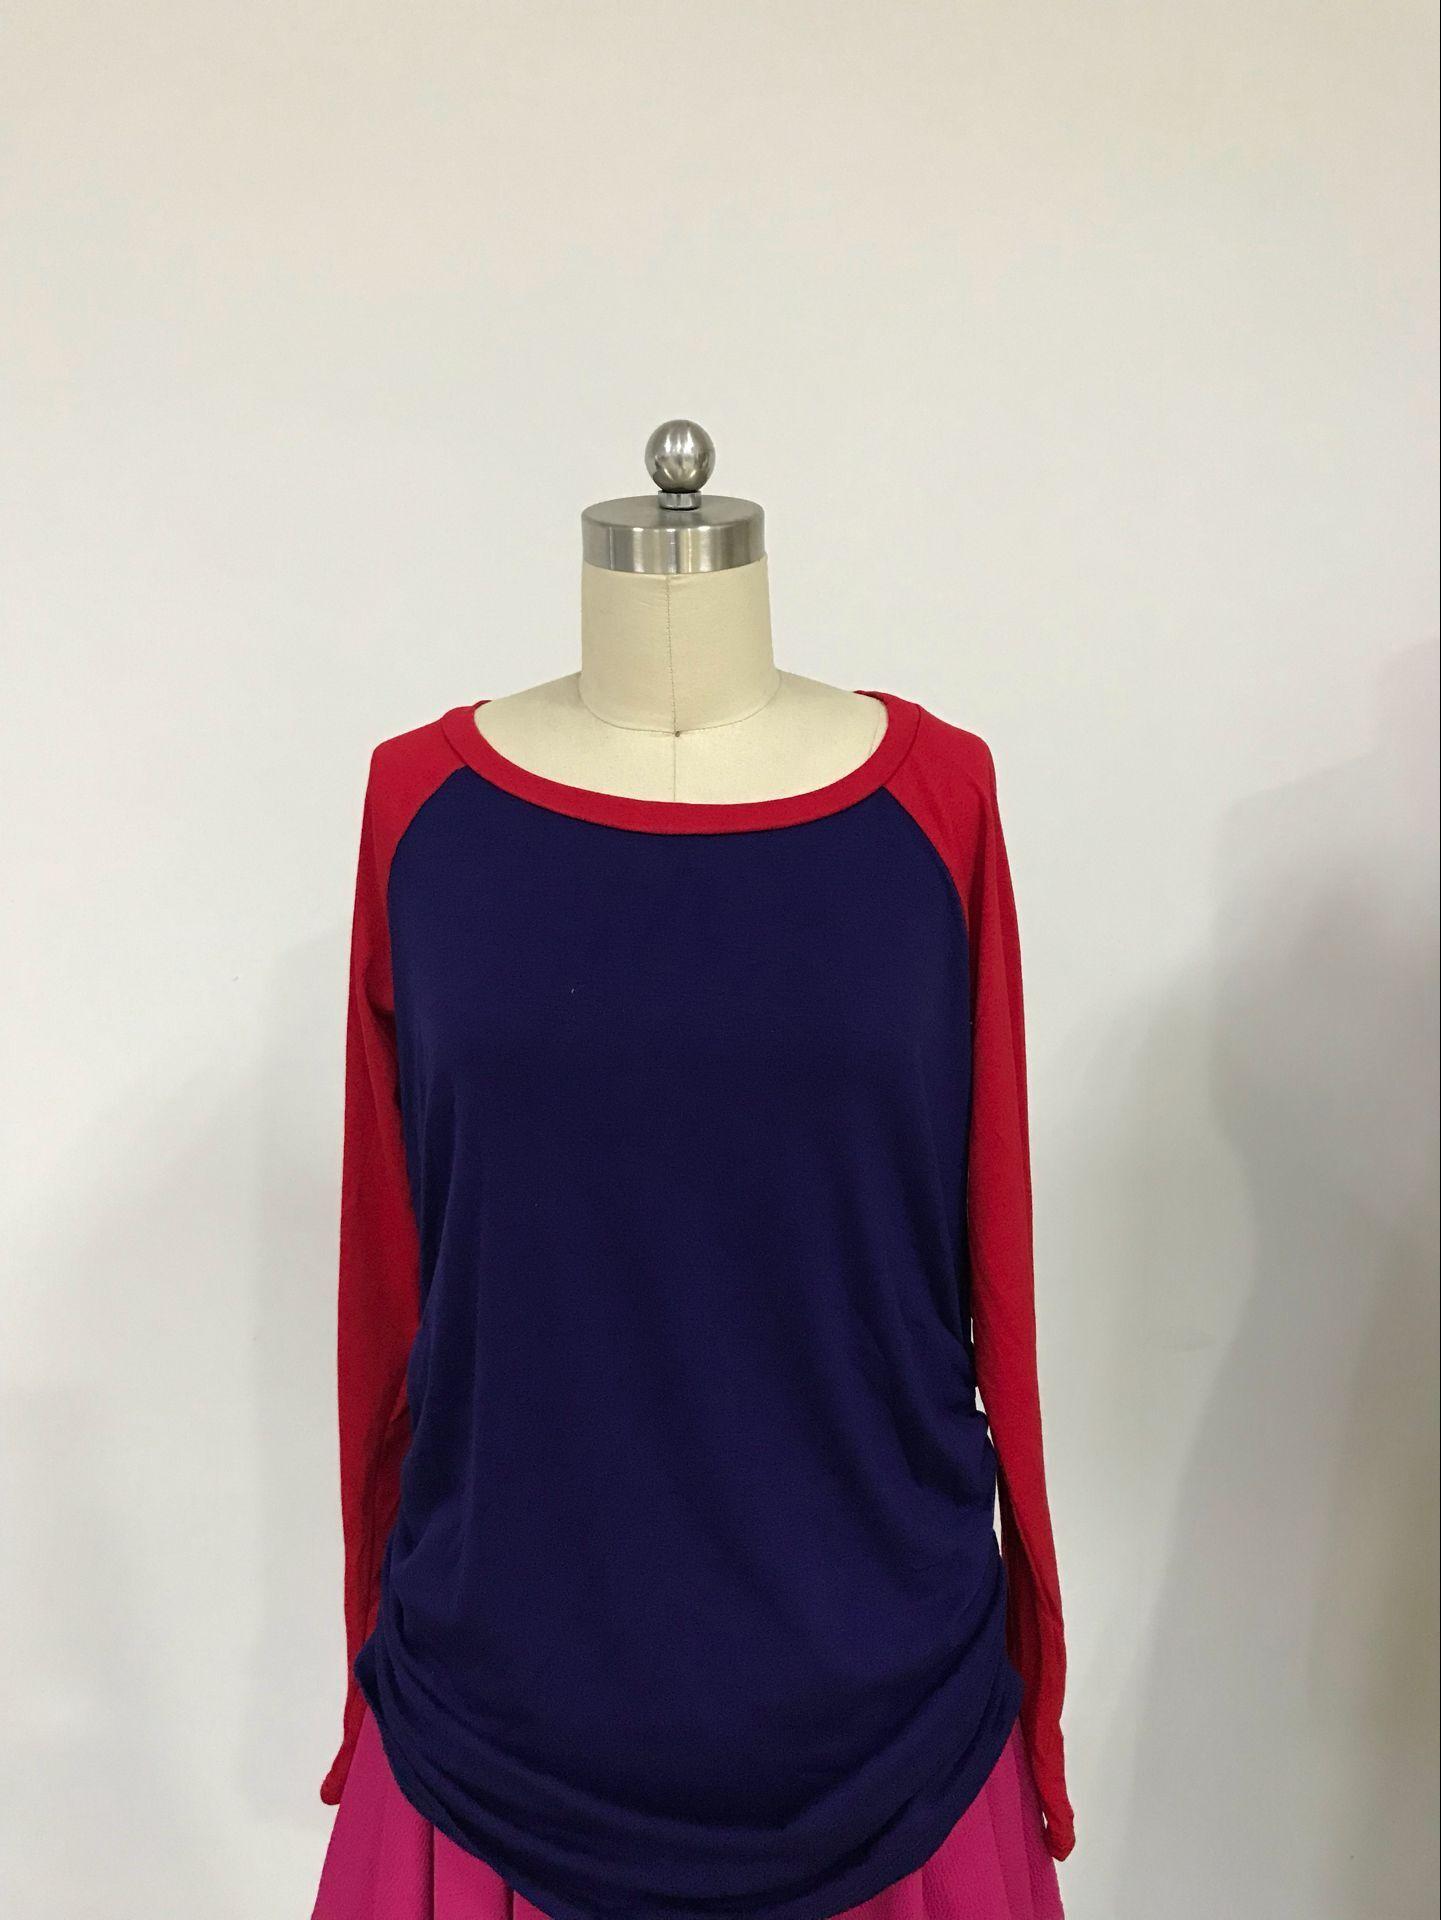 [US Direct] HiMiss Women Long Sleeve Crew Neck Baseball Raglan Maternity T-Shirts Top Royal Blue_M